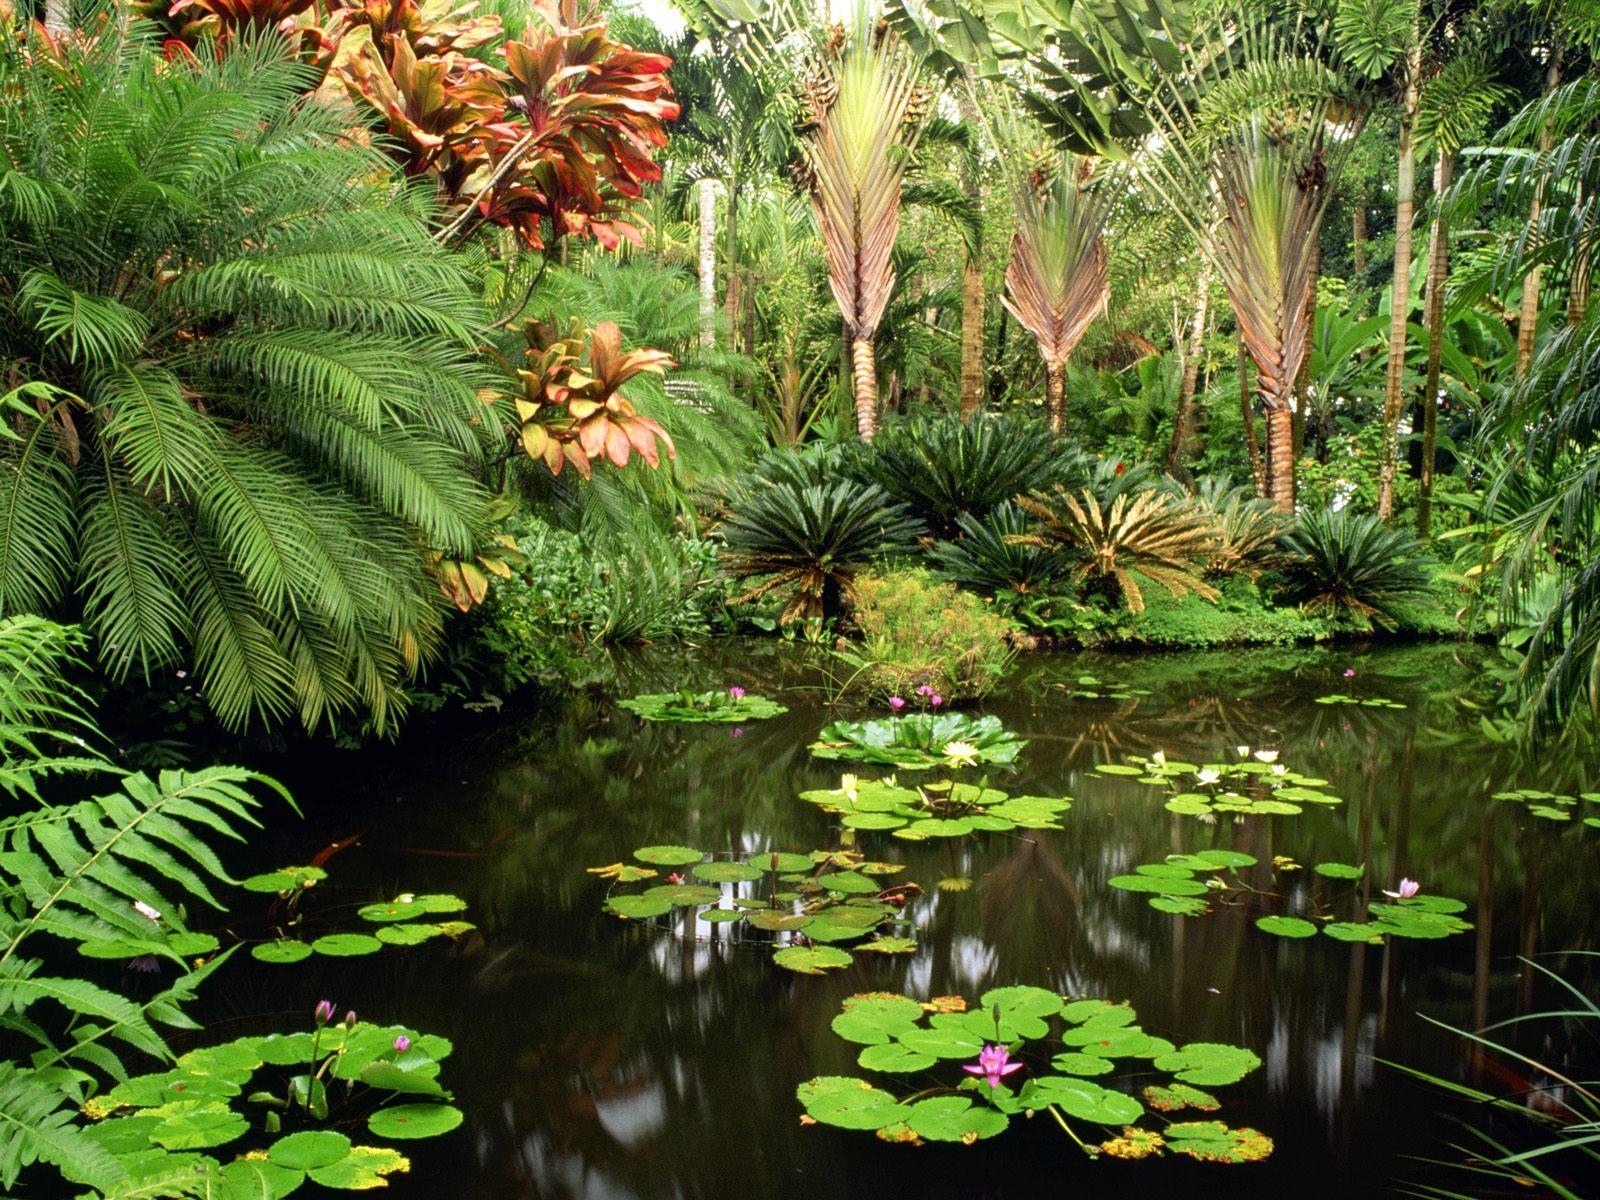 HOW TO GROW PLANTS The Garden Of Eaden